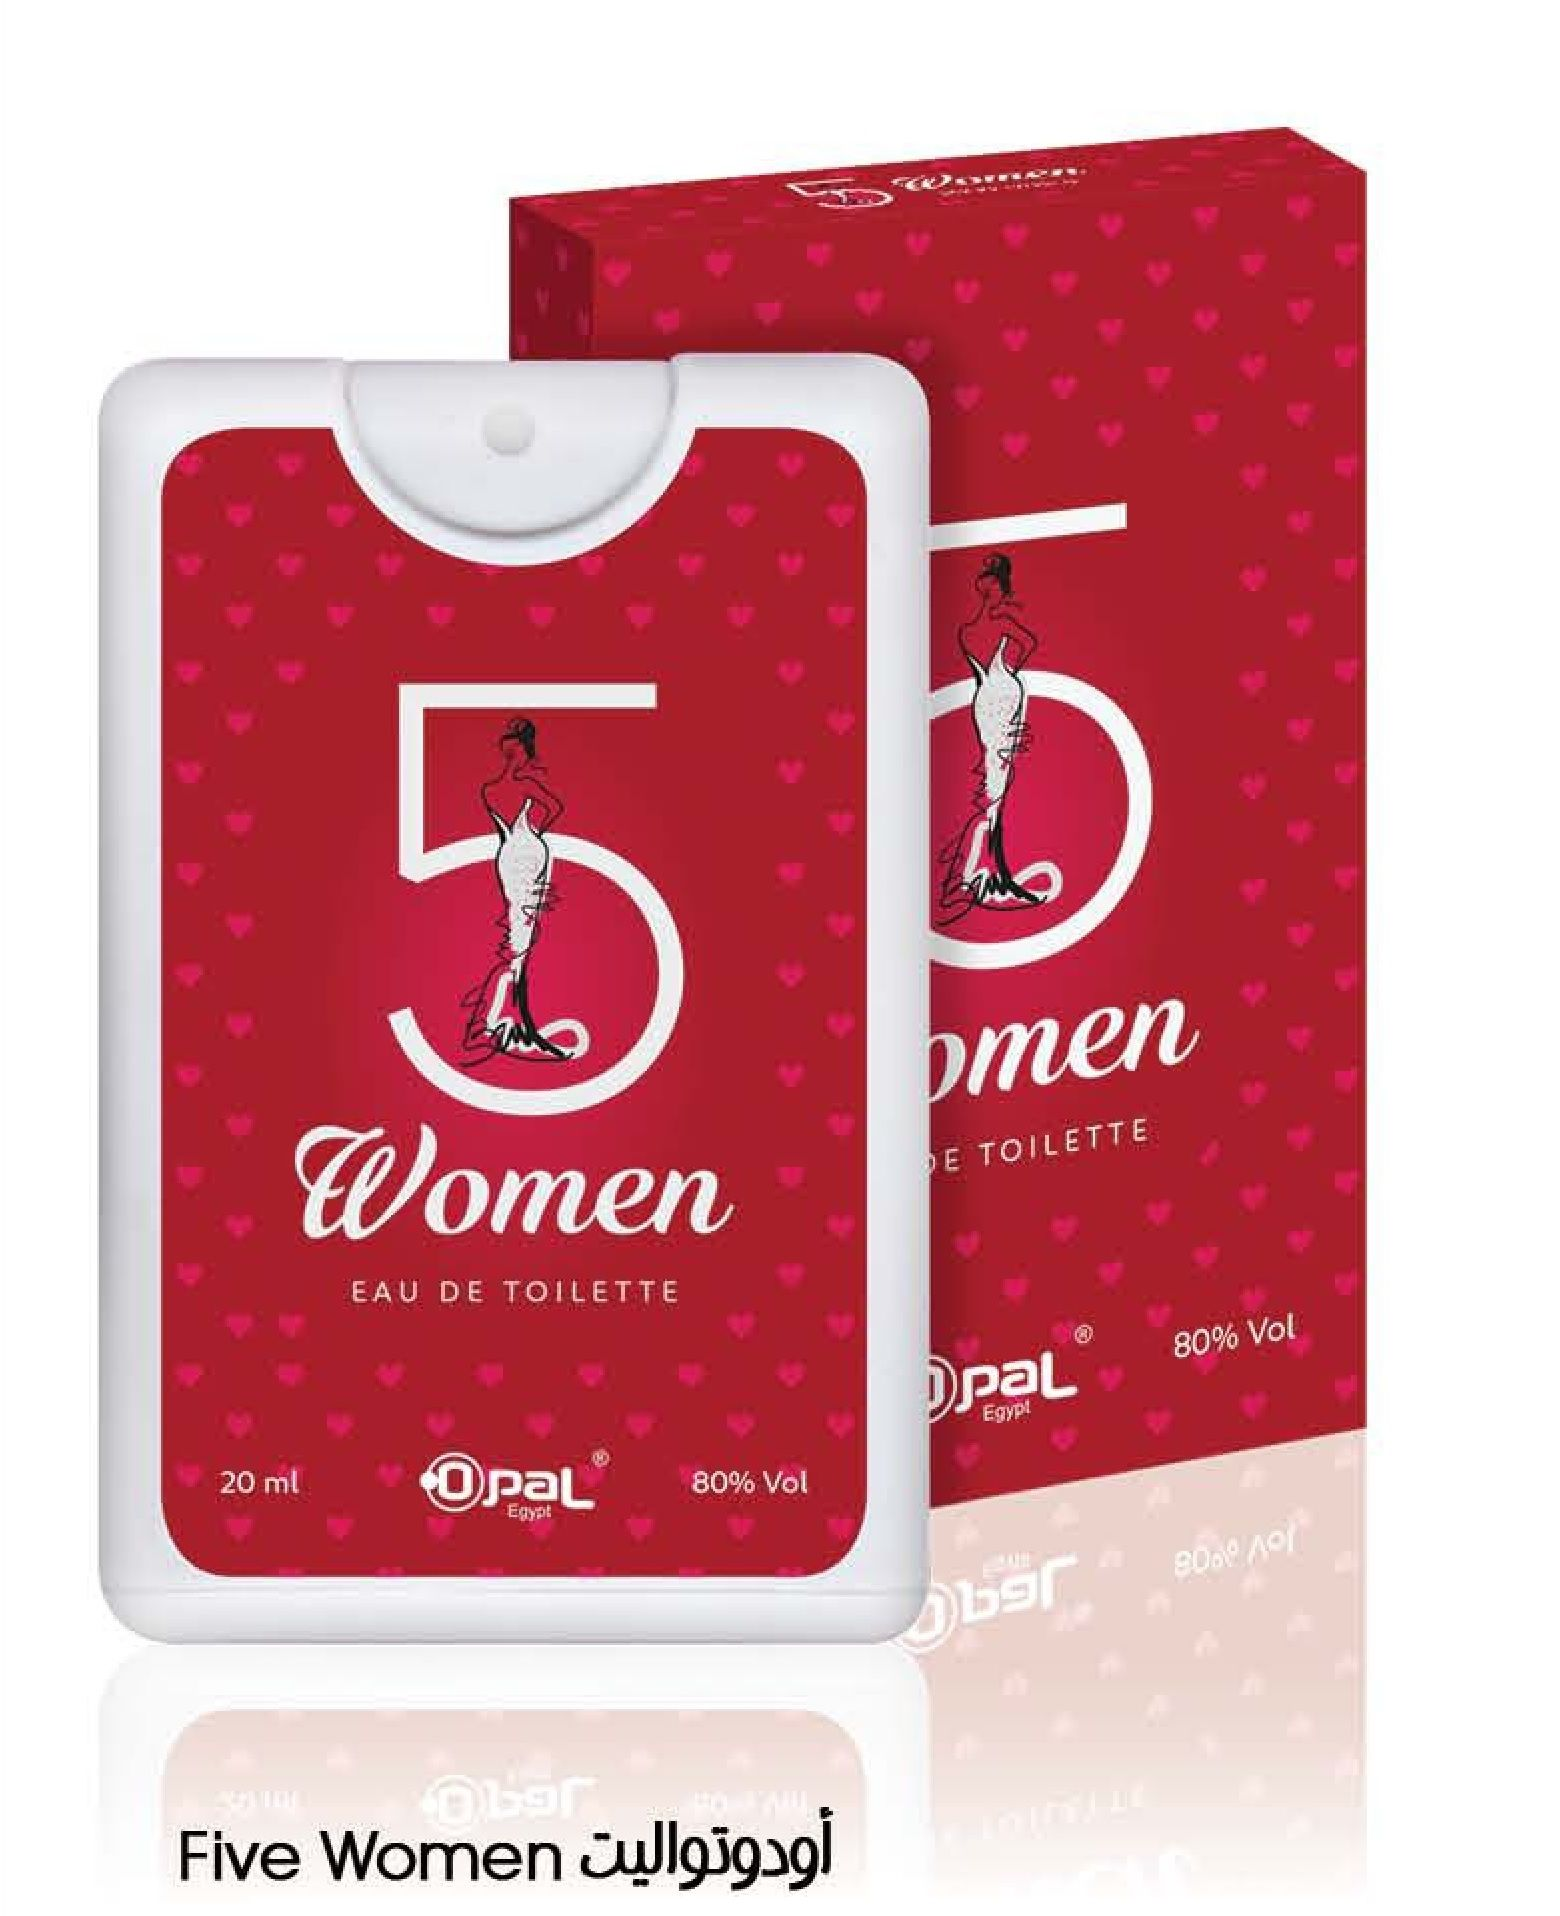 Moment Eau De Toilette For Woman 30 Ml Perfumes Fragrances Voyager Edt Buy Opal Five Women Pocket 20ml In Egypt